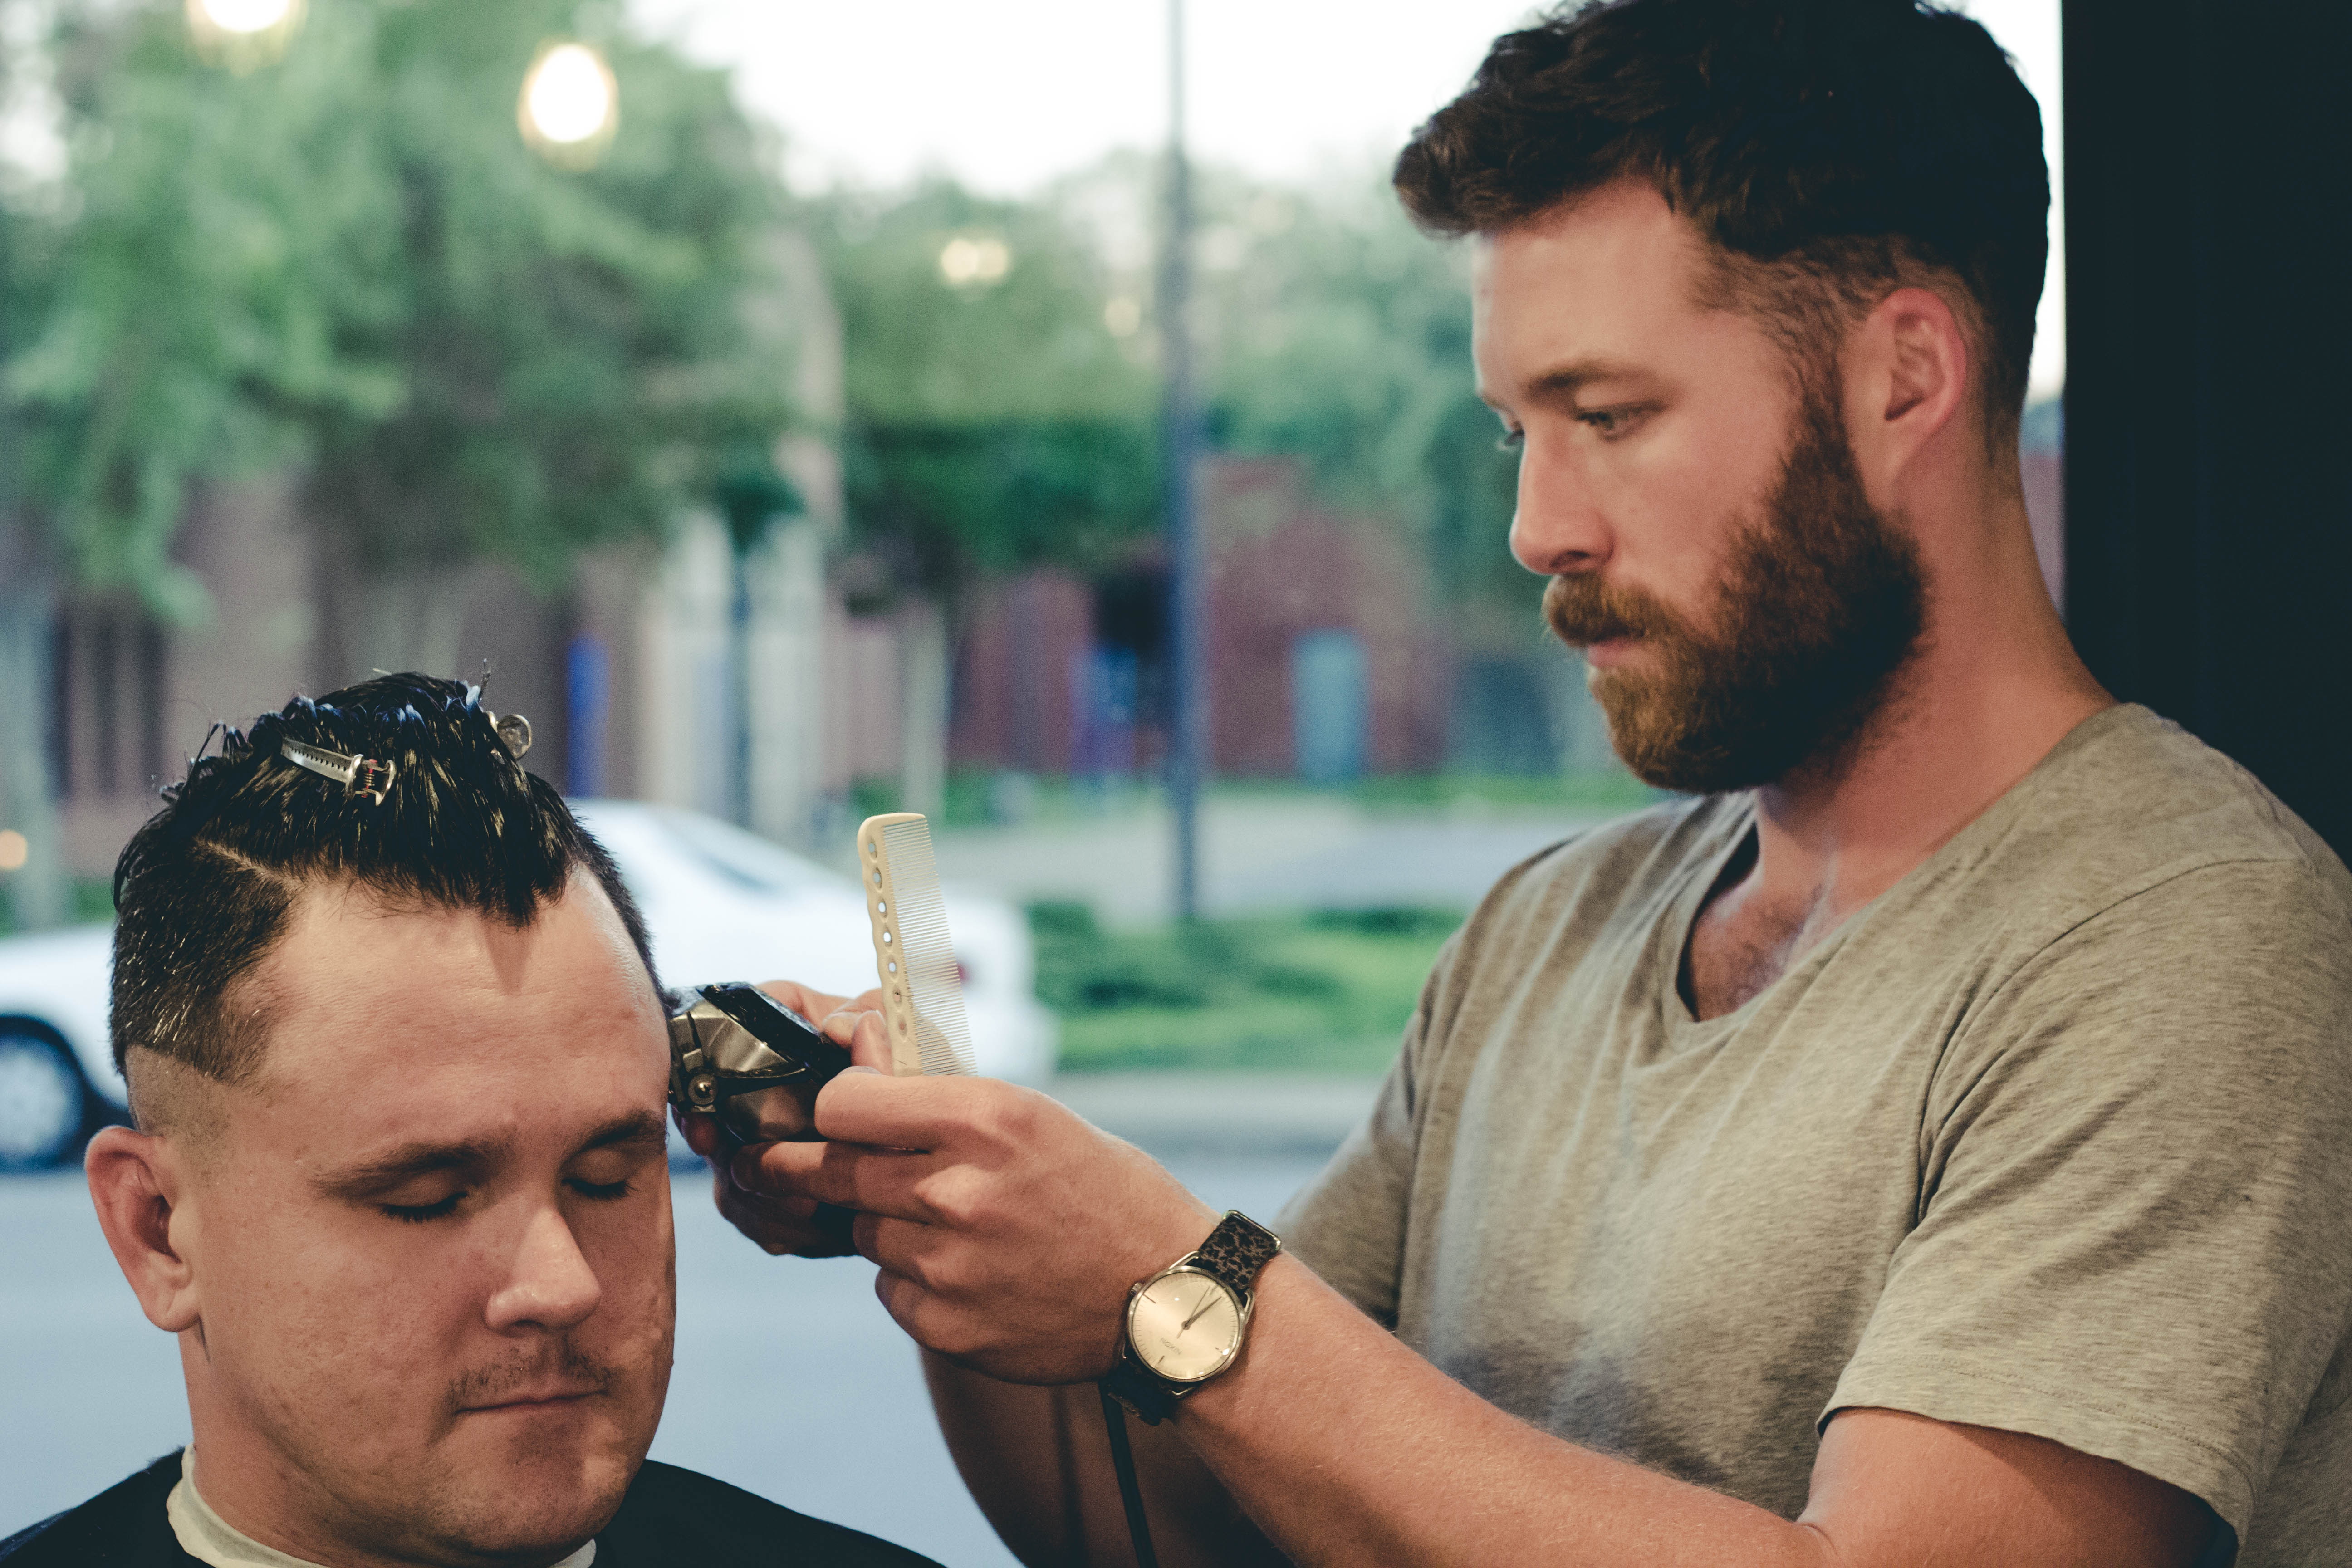 Spotlight Greasy Hands Barbershop The Shoals Alabama The Barber